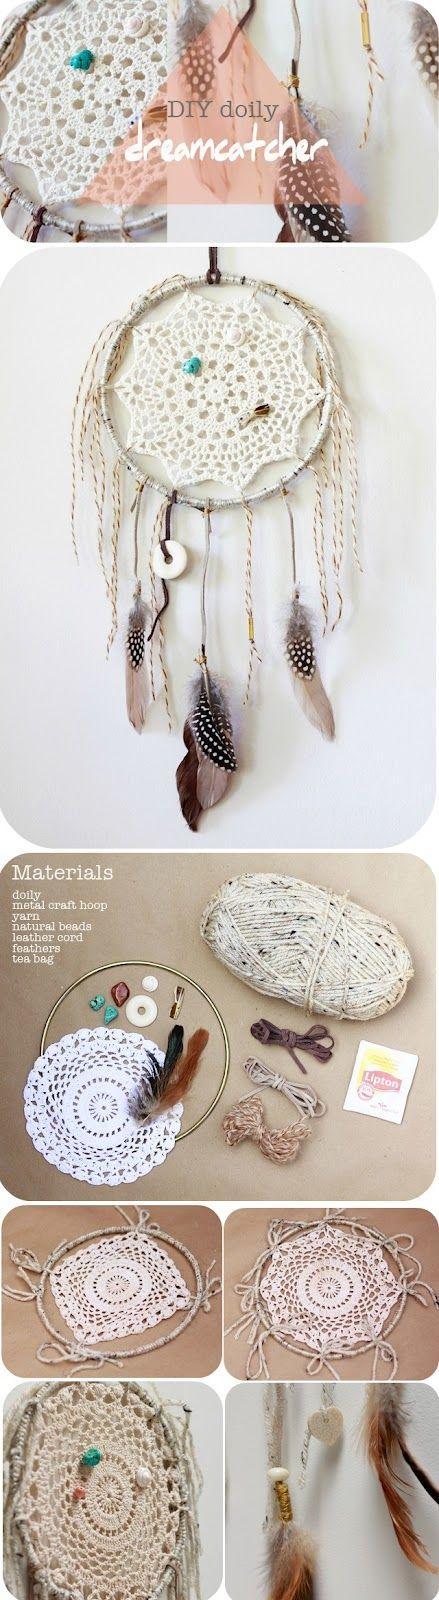 #candles #basket #hanging #dangle #beads #inspiration #horror #spooky #halloween #gothic #dried #fruit #dreamcatcher #hammock #chair #wreath #masonjar #birdcage #reupholster #clock #space #meditation #painting #lamp #nature #mirror #decoration #frame #doormat #bottle #light #alter #nerd #geek